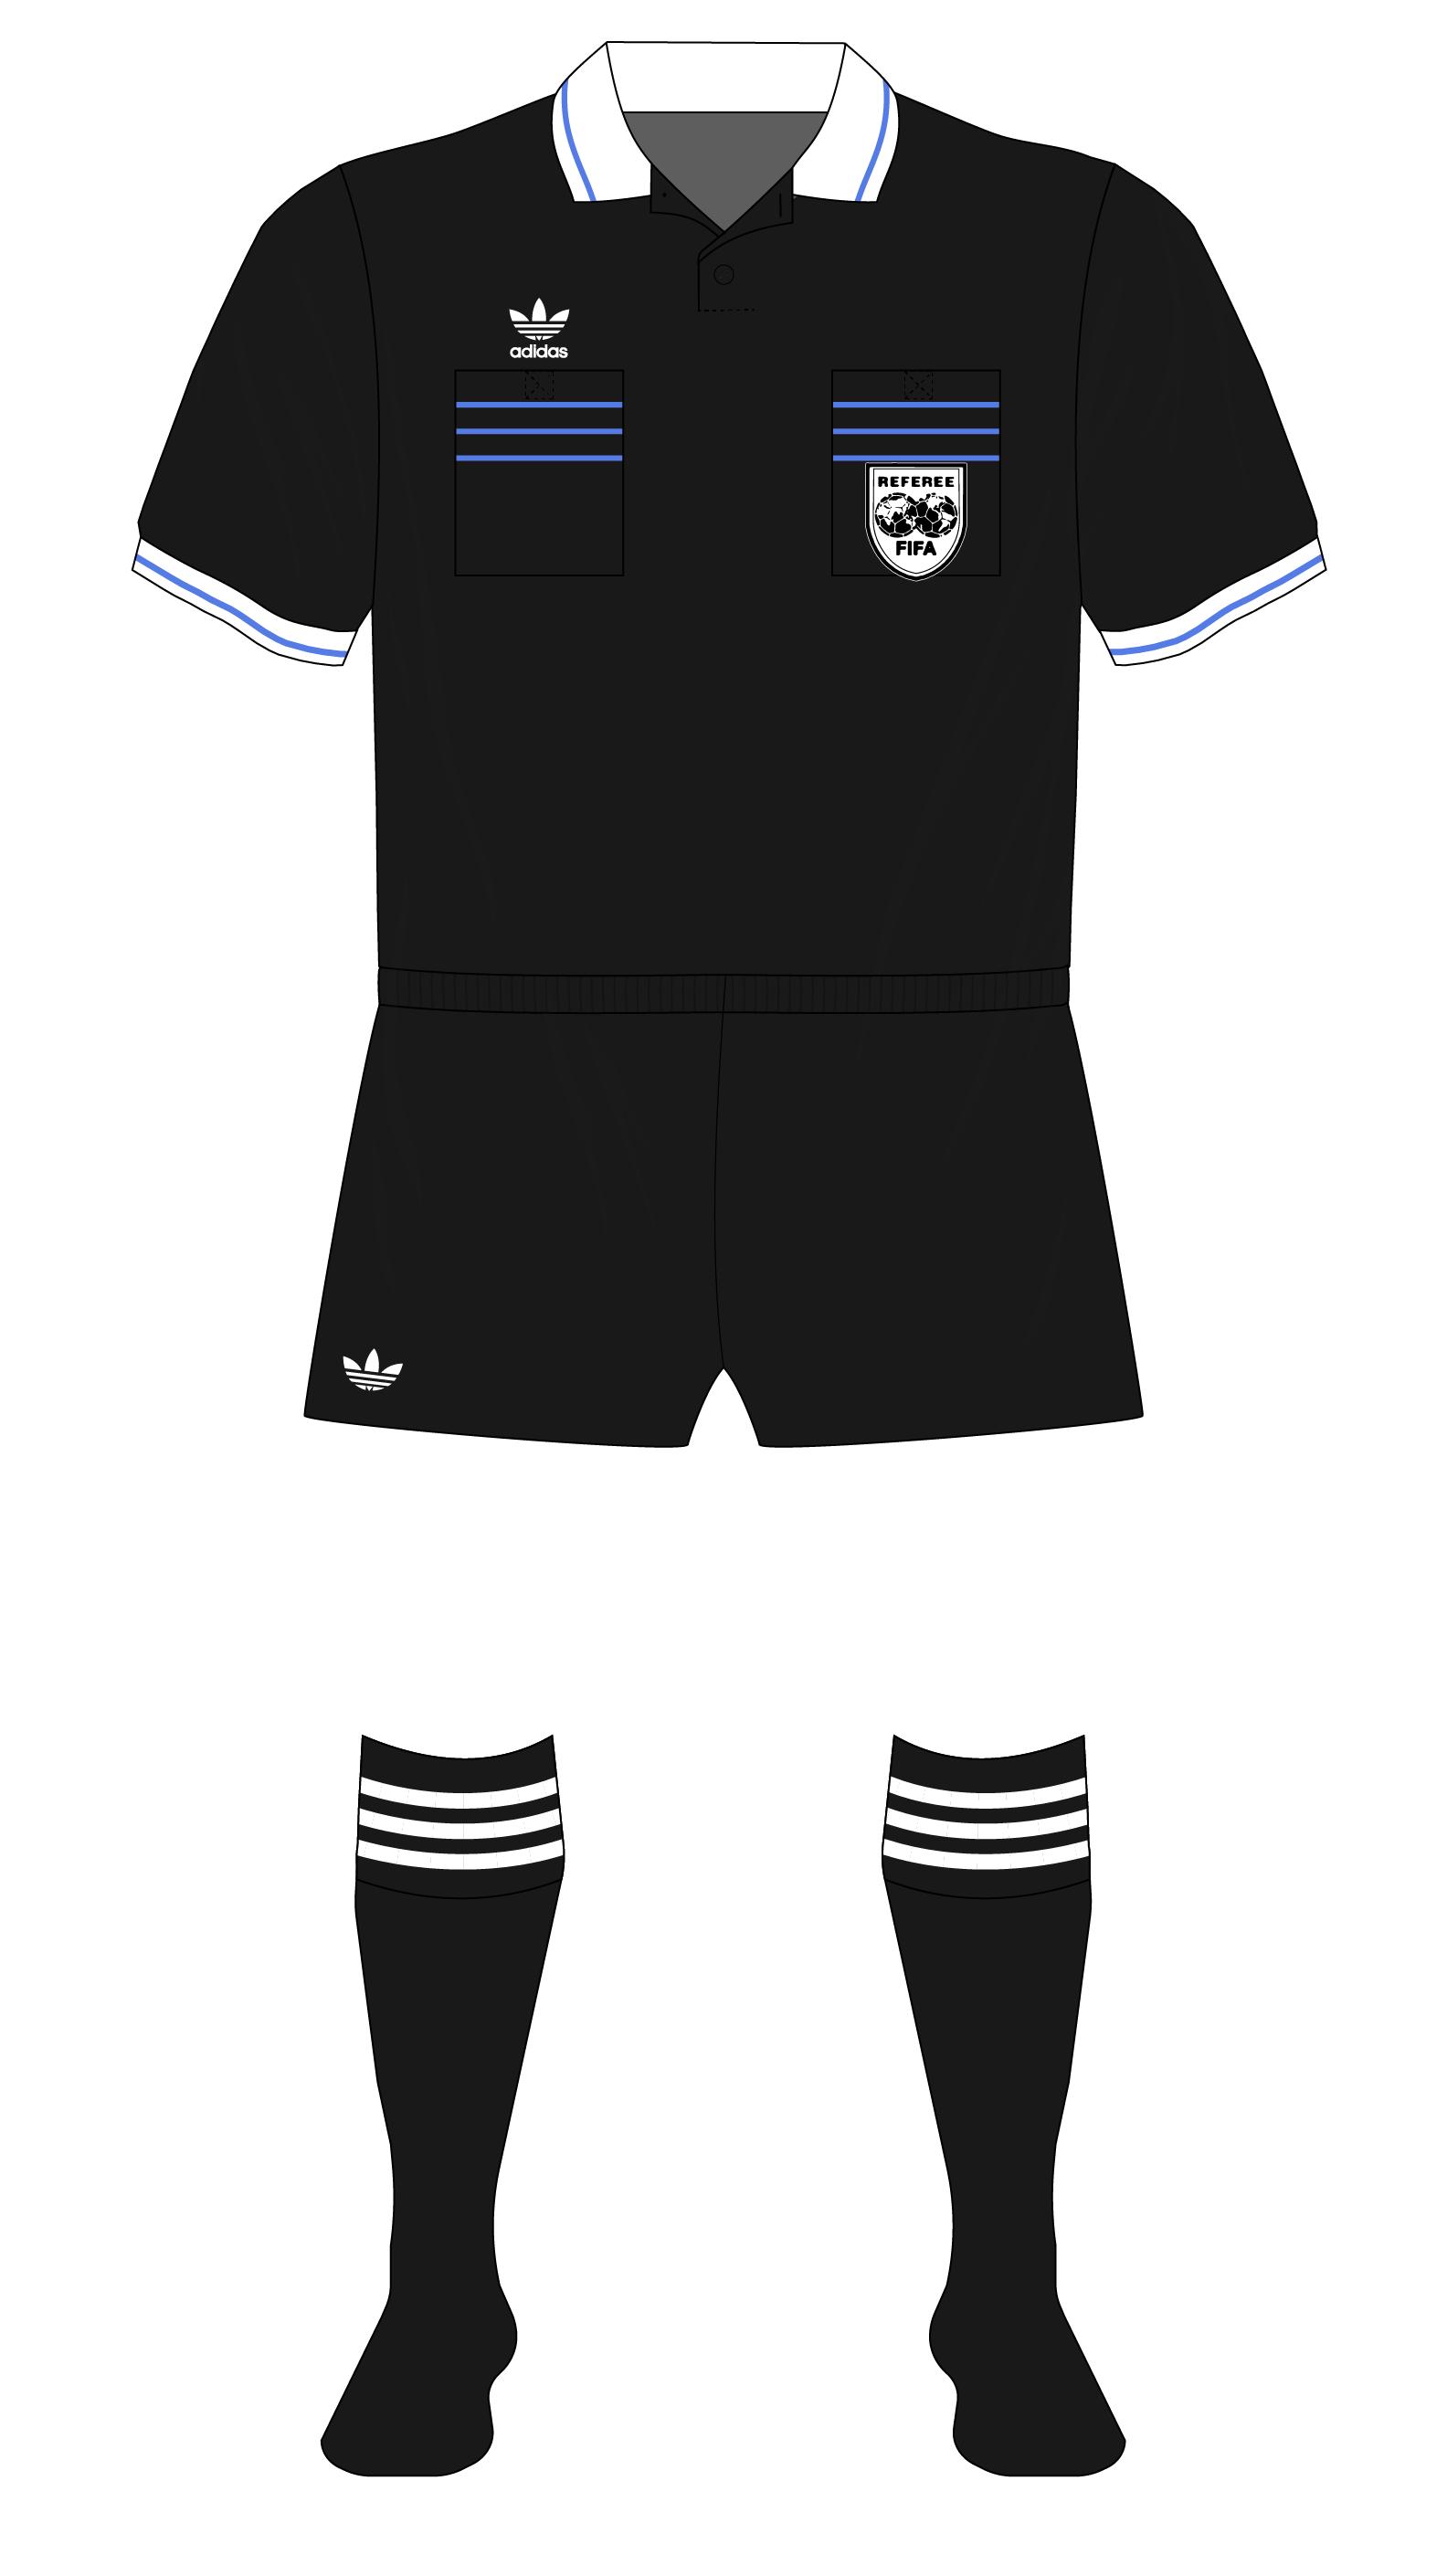 adidas-Referee-1990-black-short-sleeves-01 – Museum of Jerseys